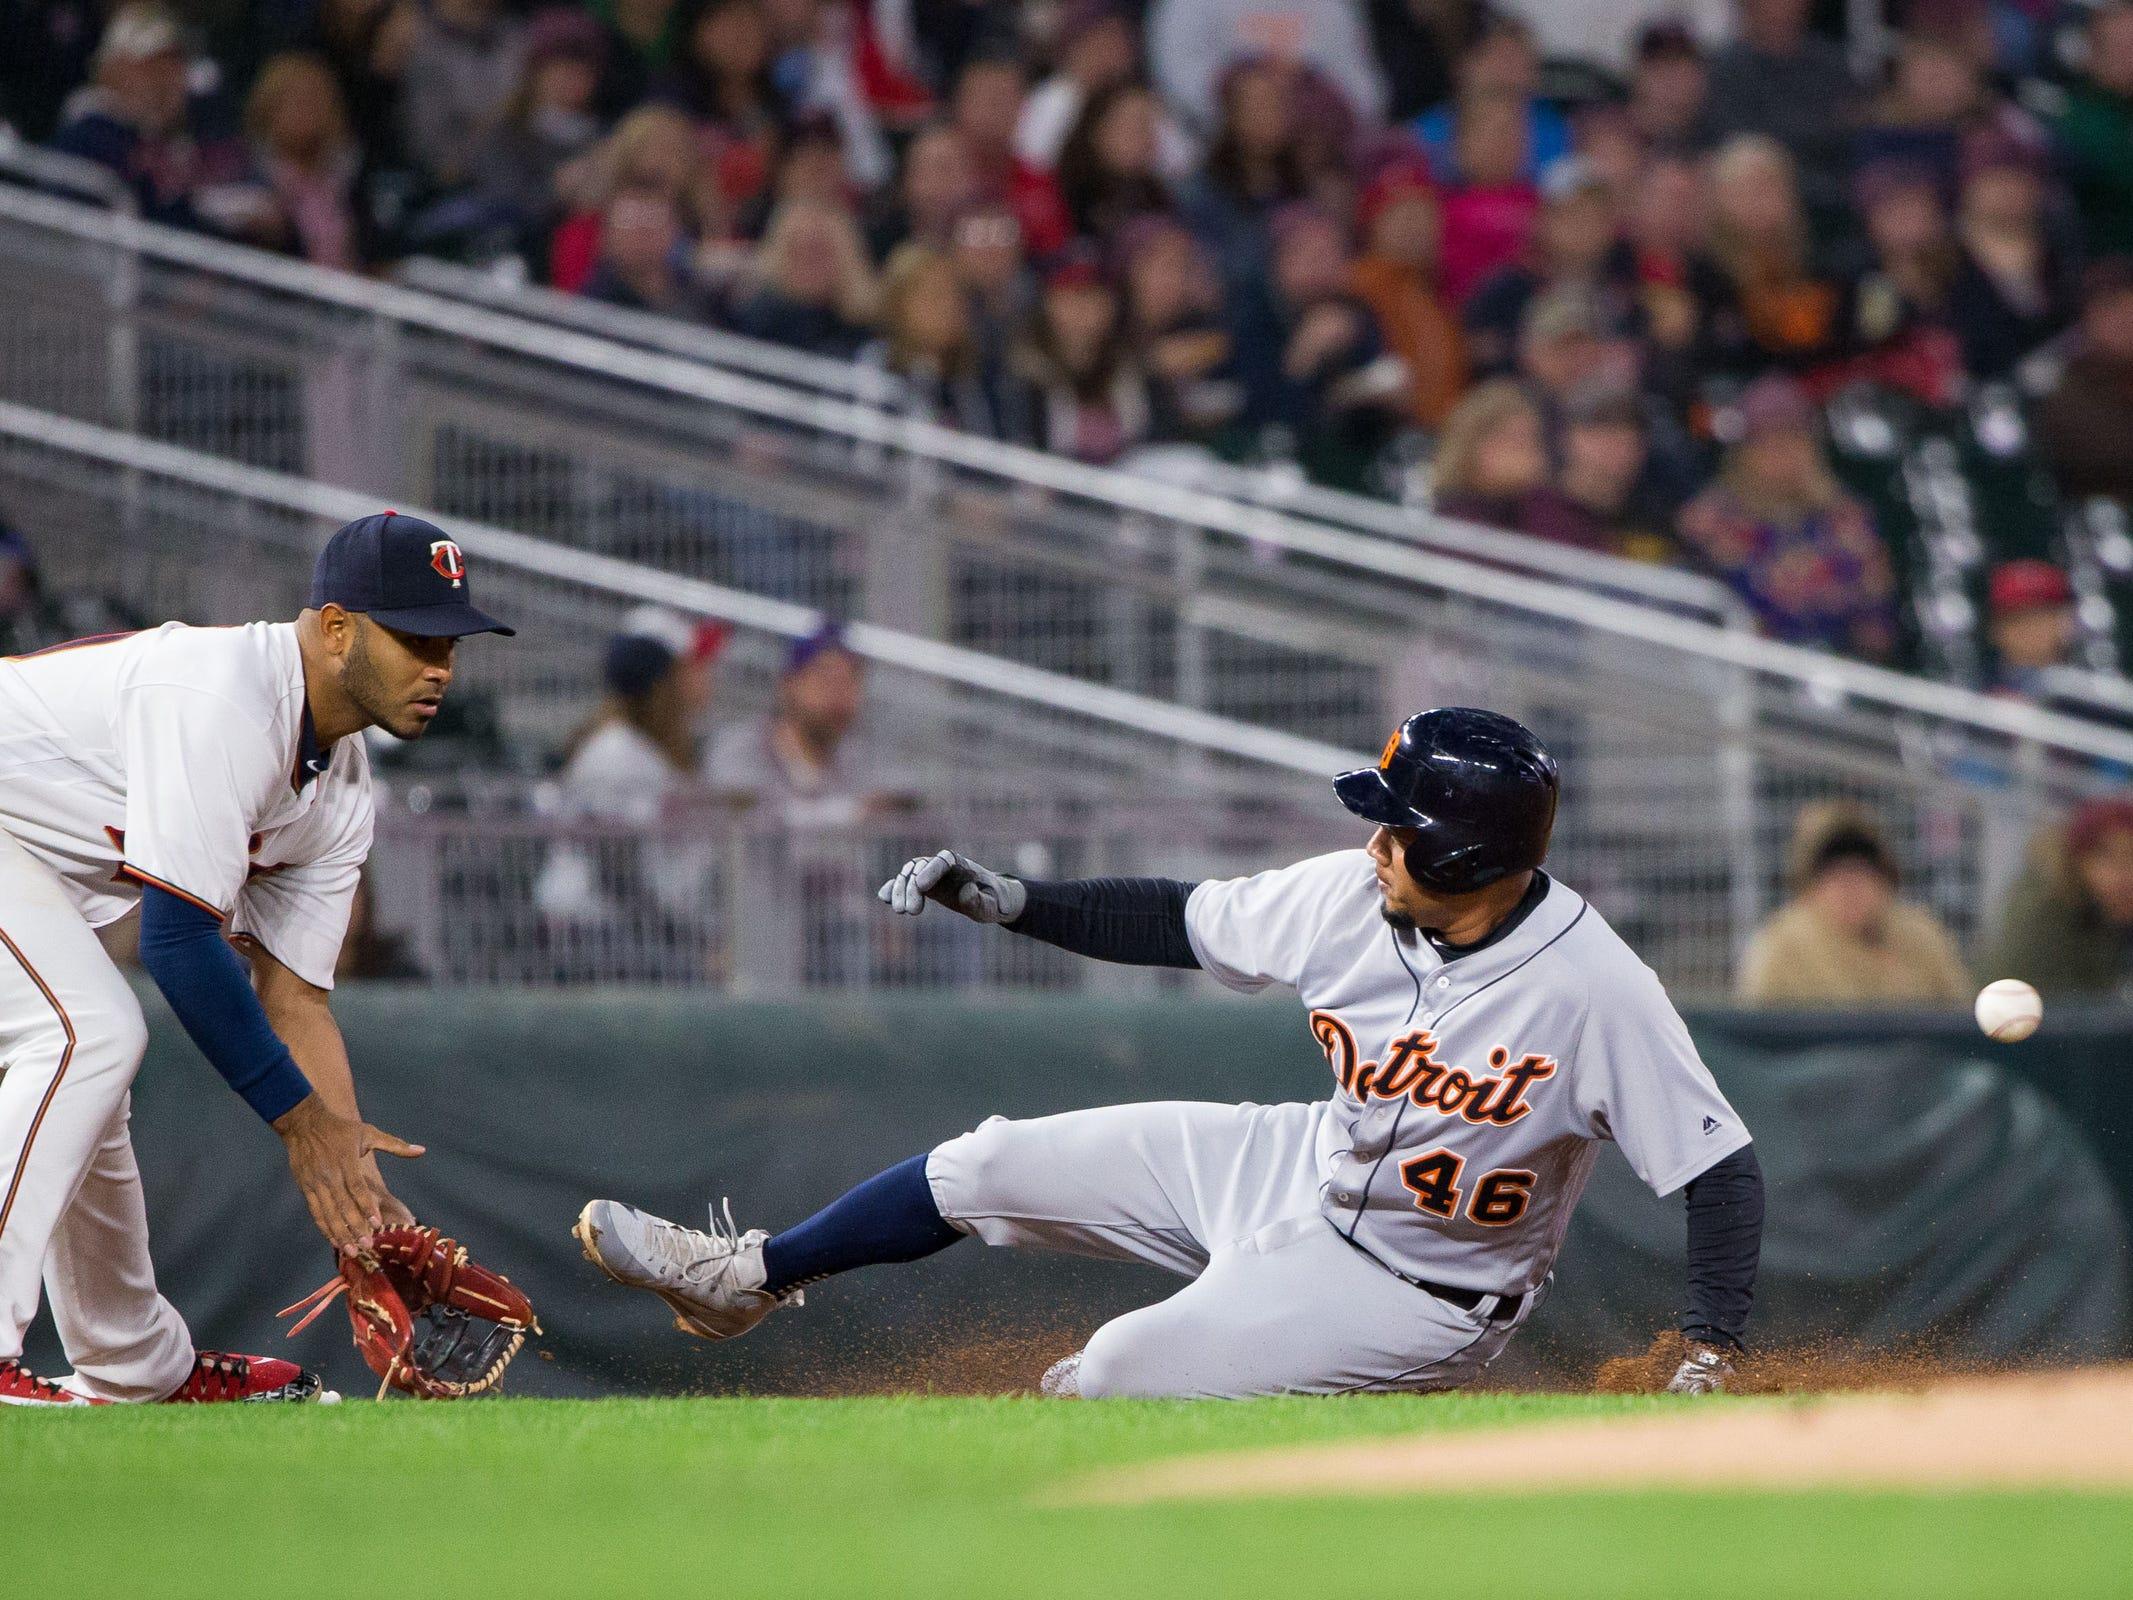 Sept. 27, 2018 in Minneapolis, Minn.: Detroit Tigers third baseman Jeimer Candelario slides into third base in the first inning against Minnesota Twins third baseman Gregorio Petit at Target Field.